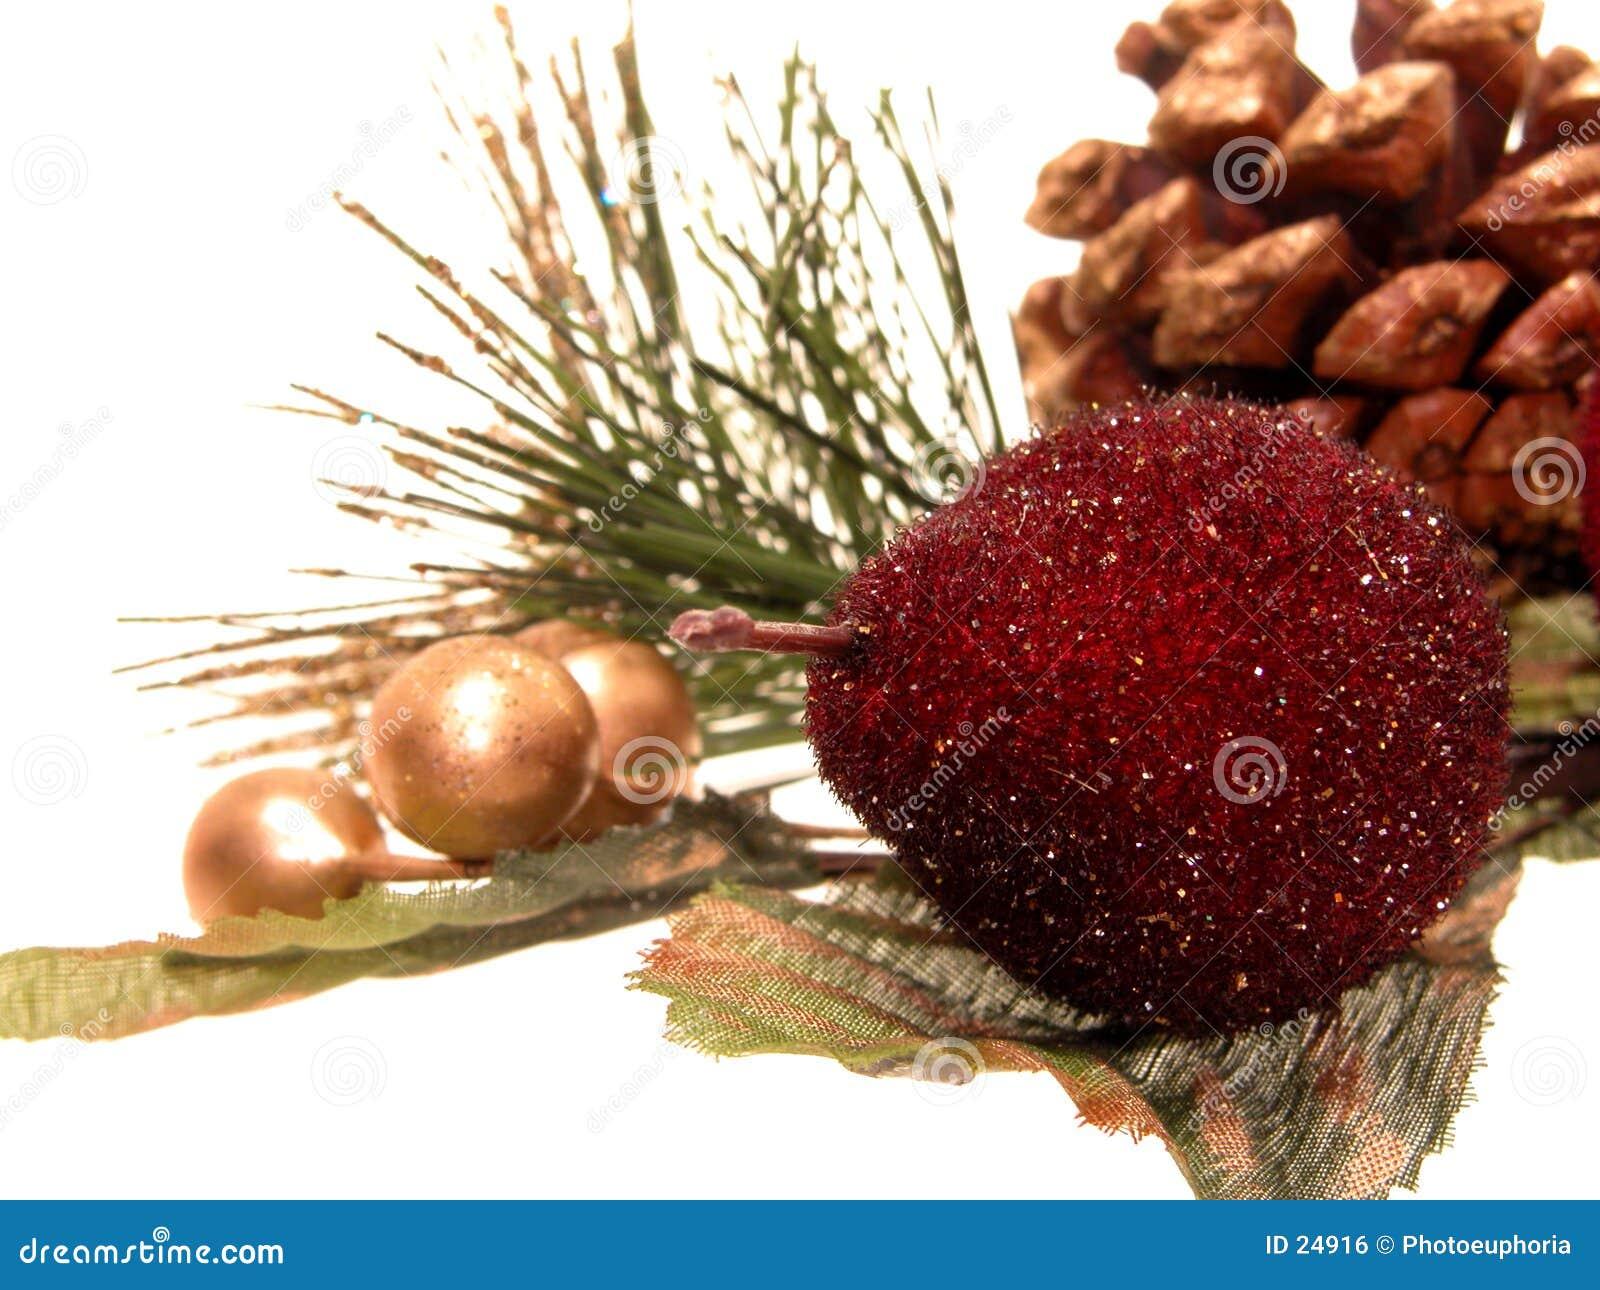 Vacances : Décorations artificielles de Noël